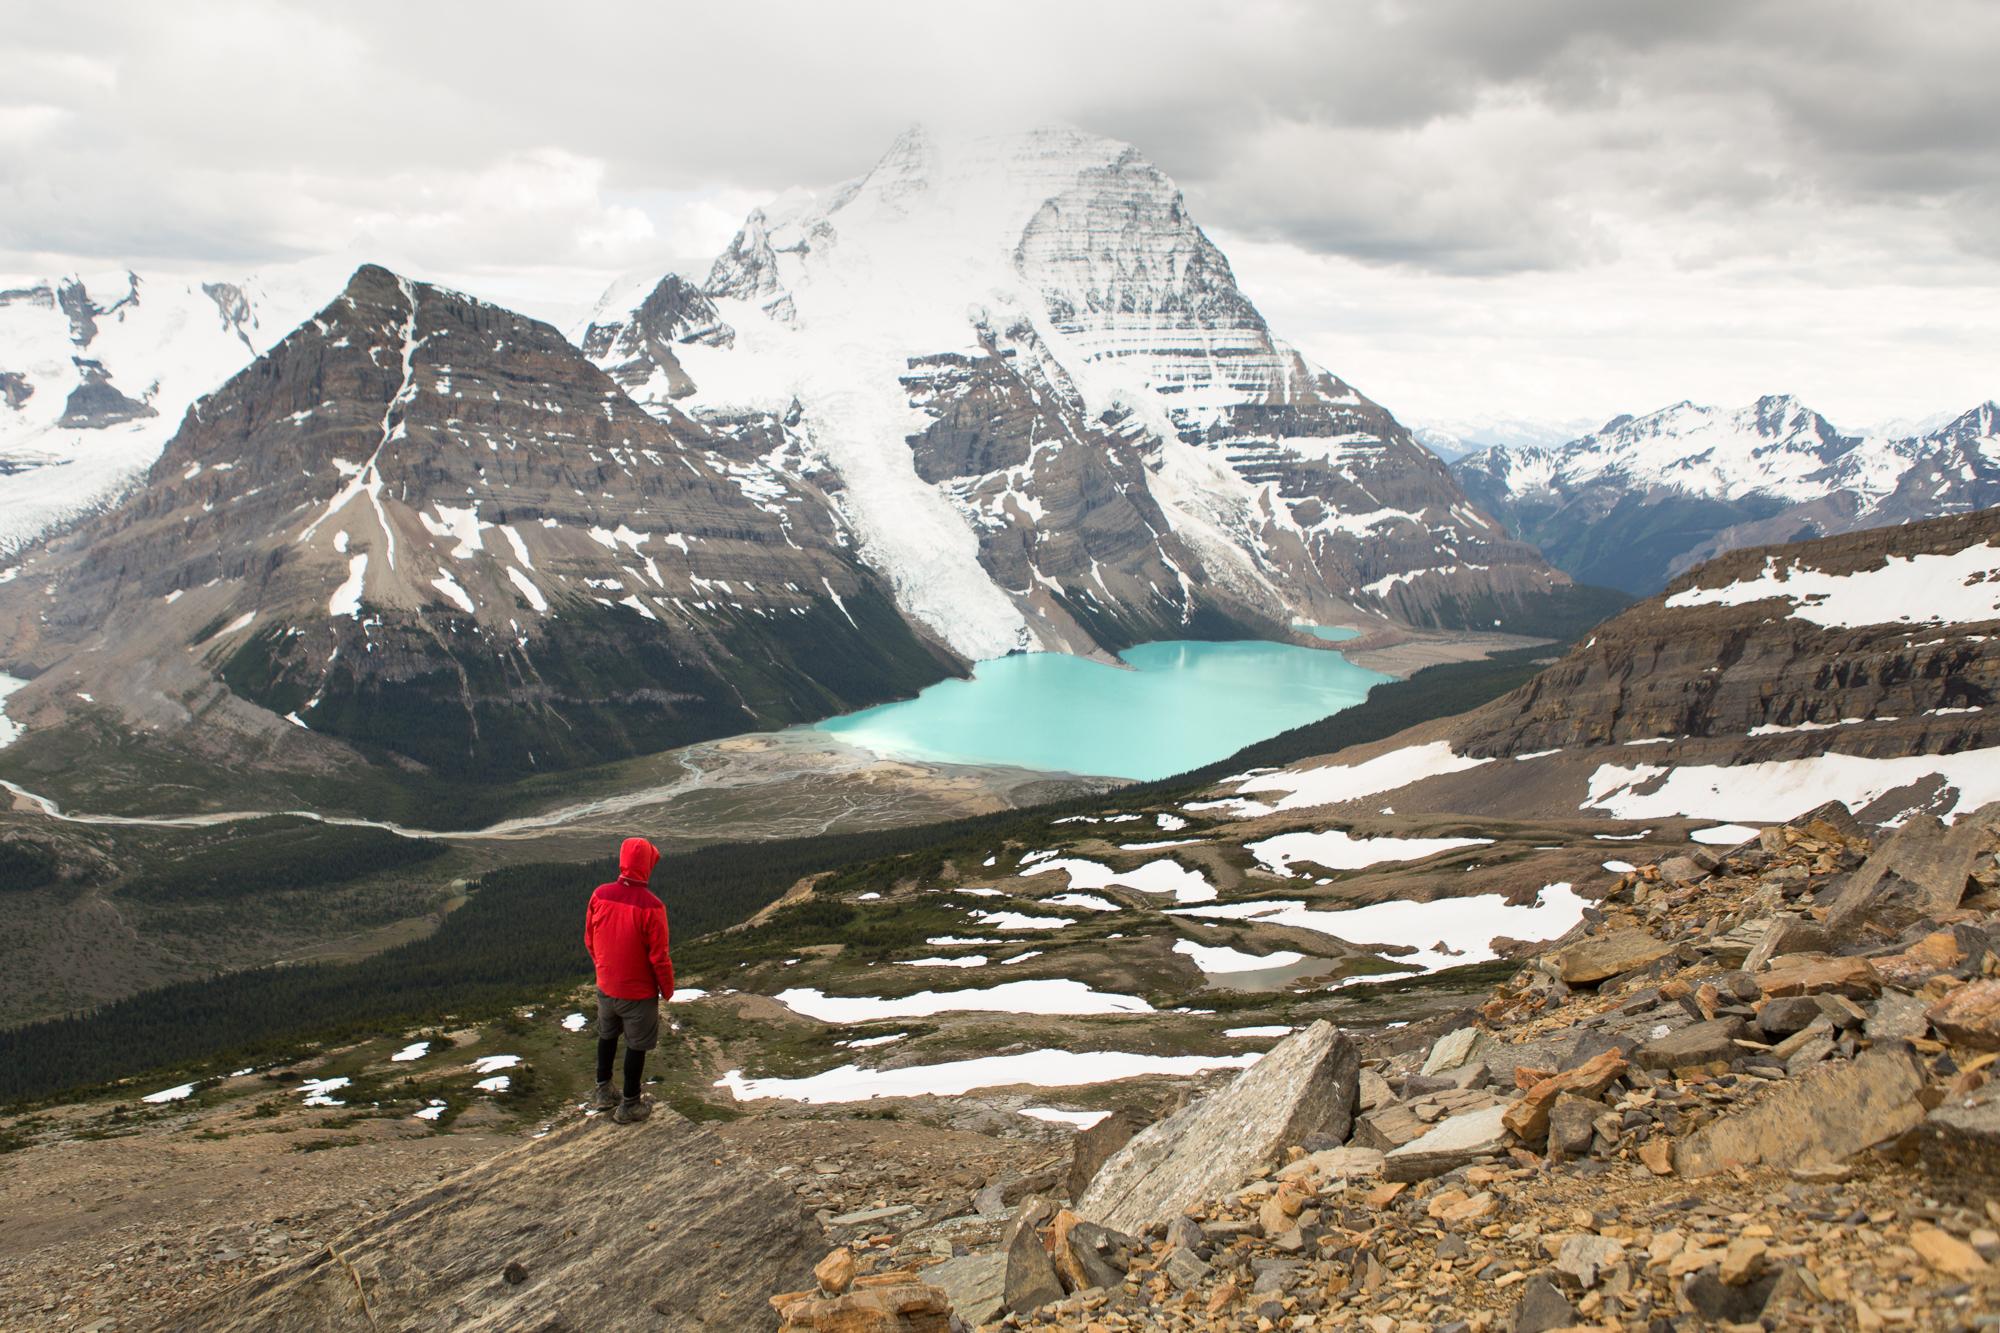 15-Bec_Kilpatrick_Photography_CanadaBEC_5575